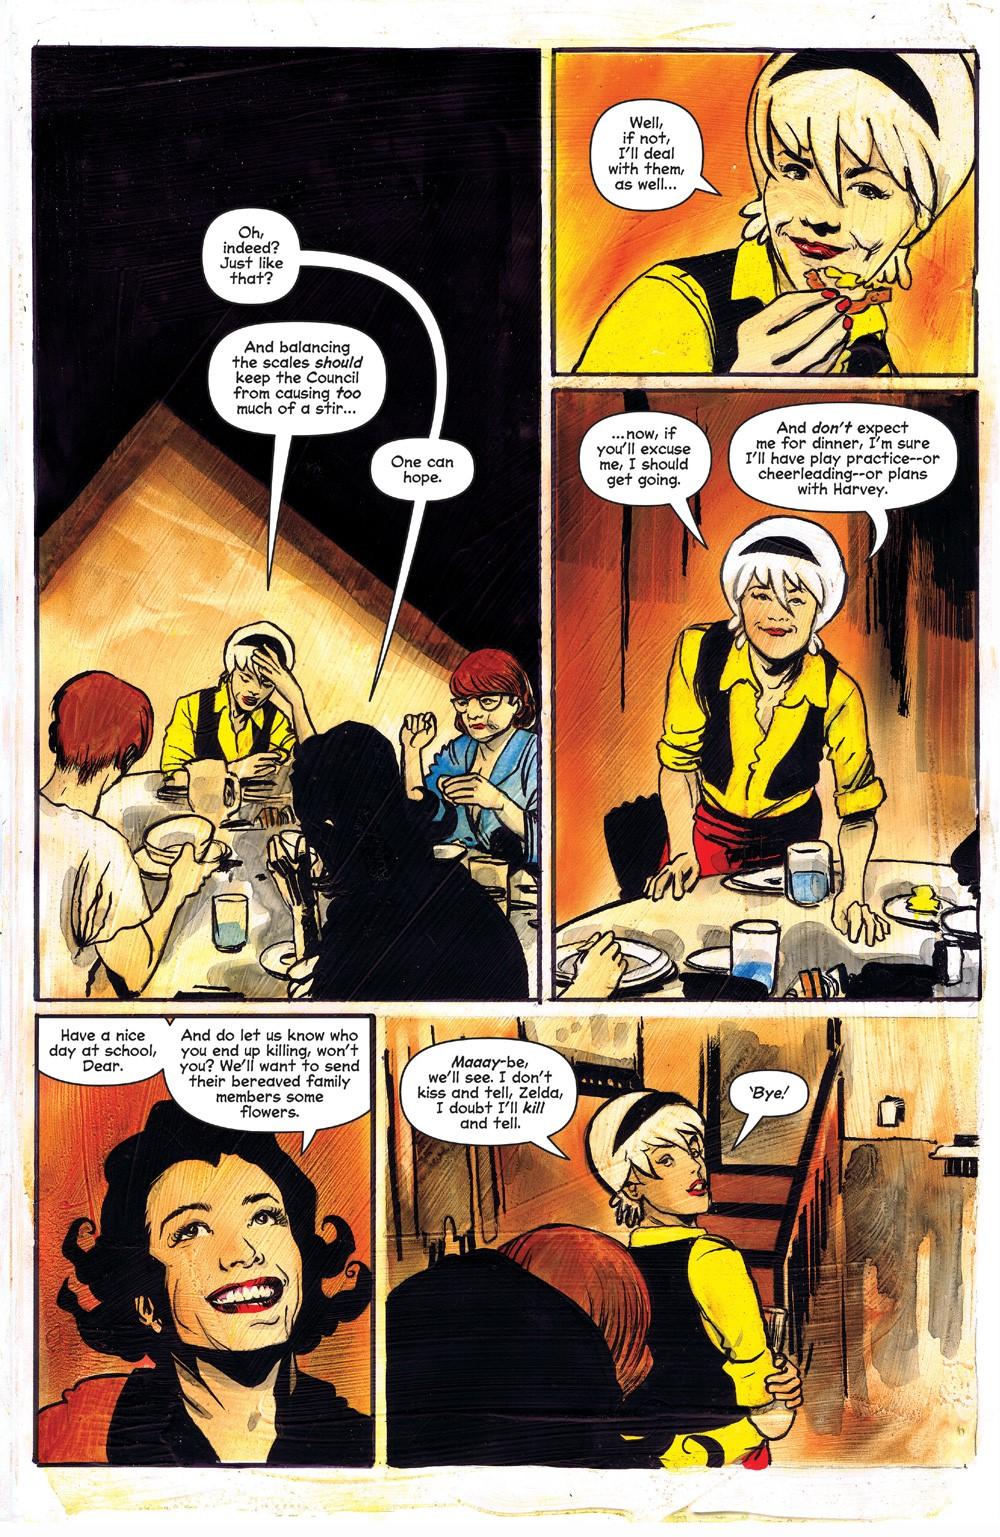 ChillingAdventuresOfSabrina_09-04 ComicList Previews: CHILLING ADVENTURES OF SABRINA #9